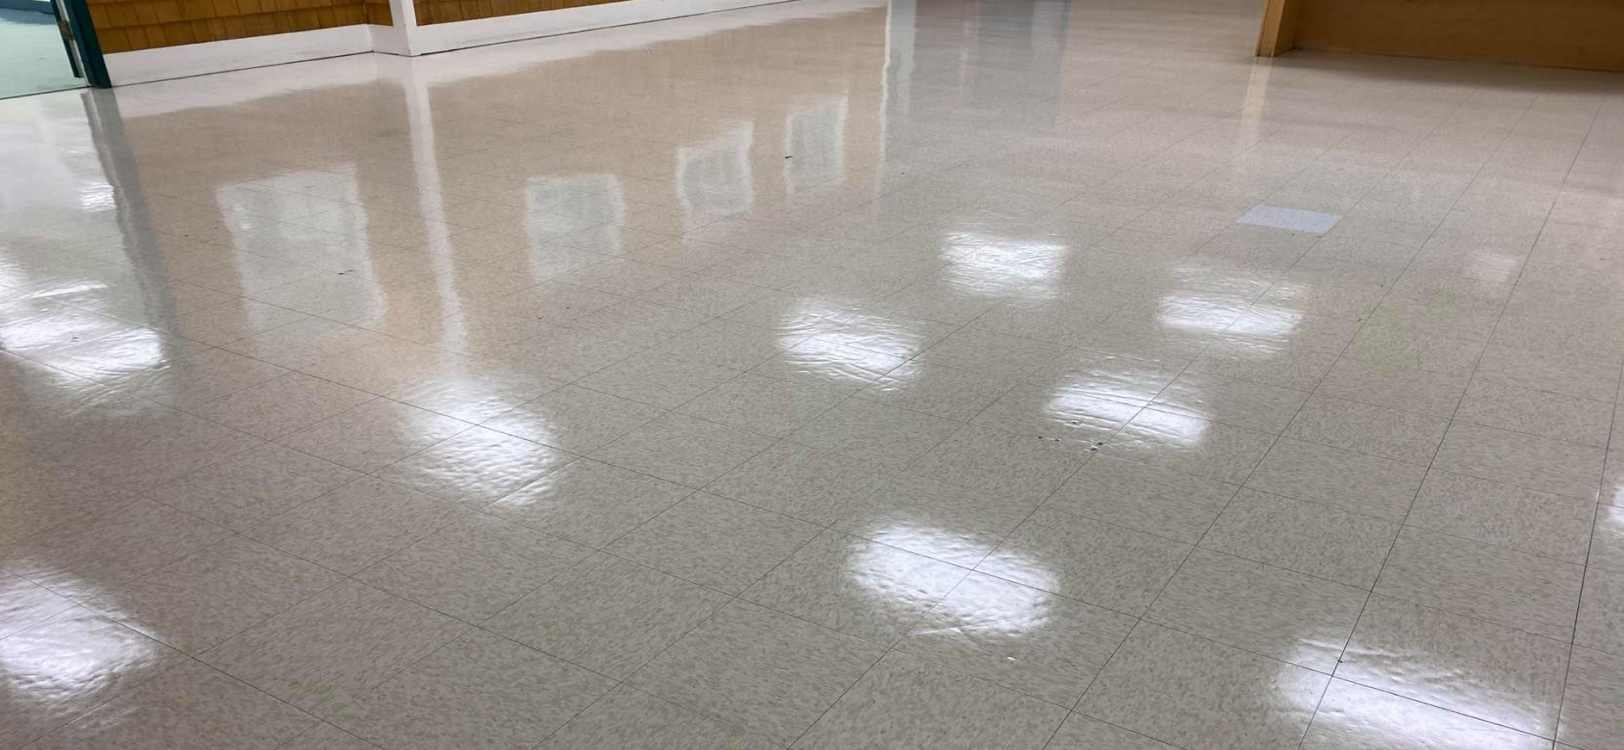 Local Floor Waxing Company Fall River MA